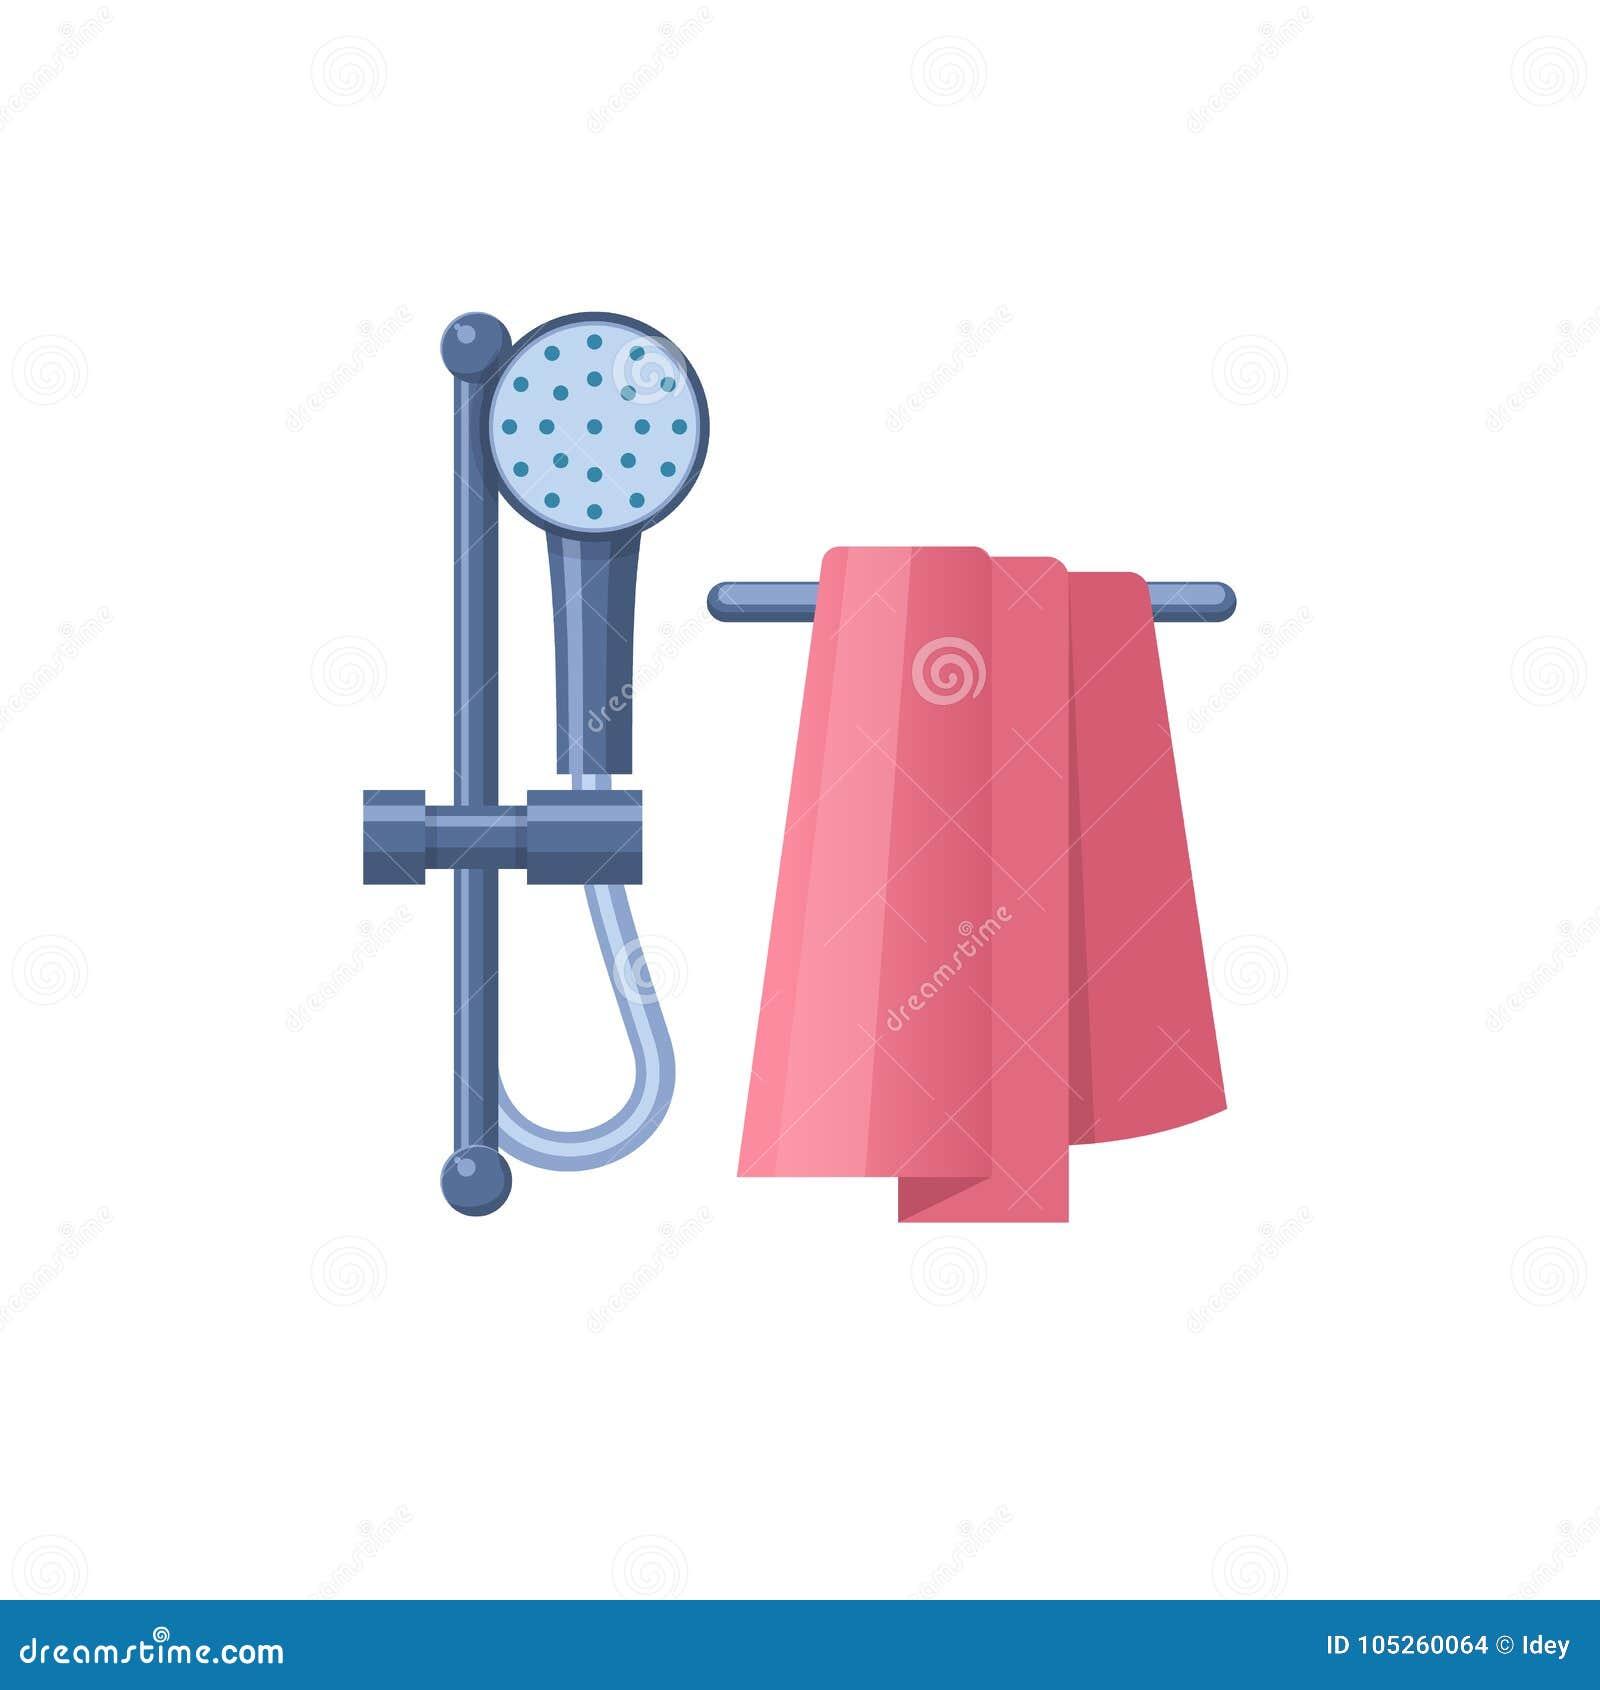 Badrummet badar eller badar hem- möblemang för duschrum